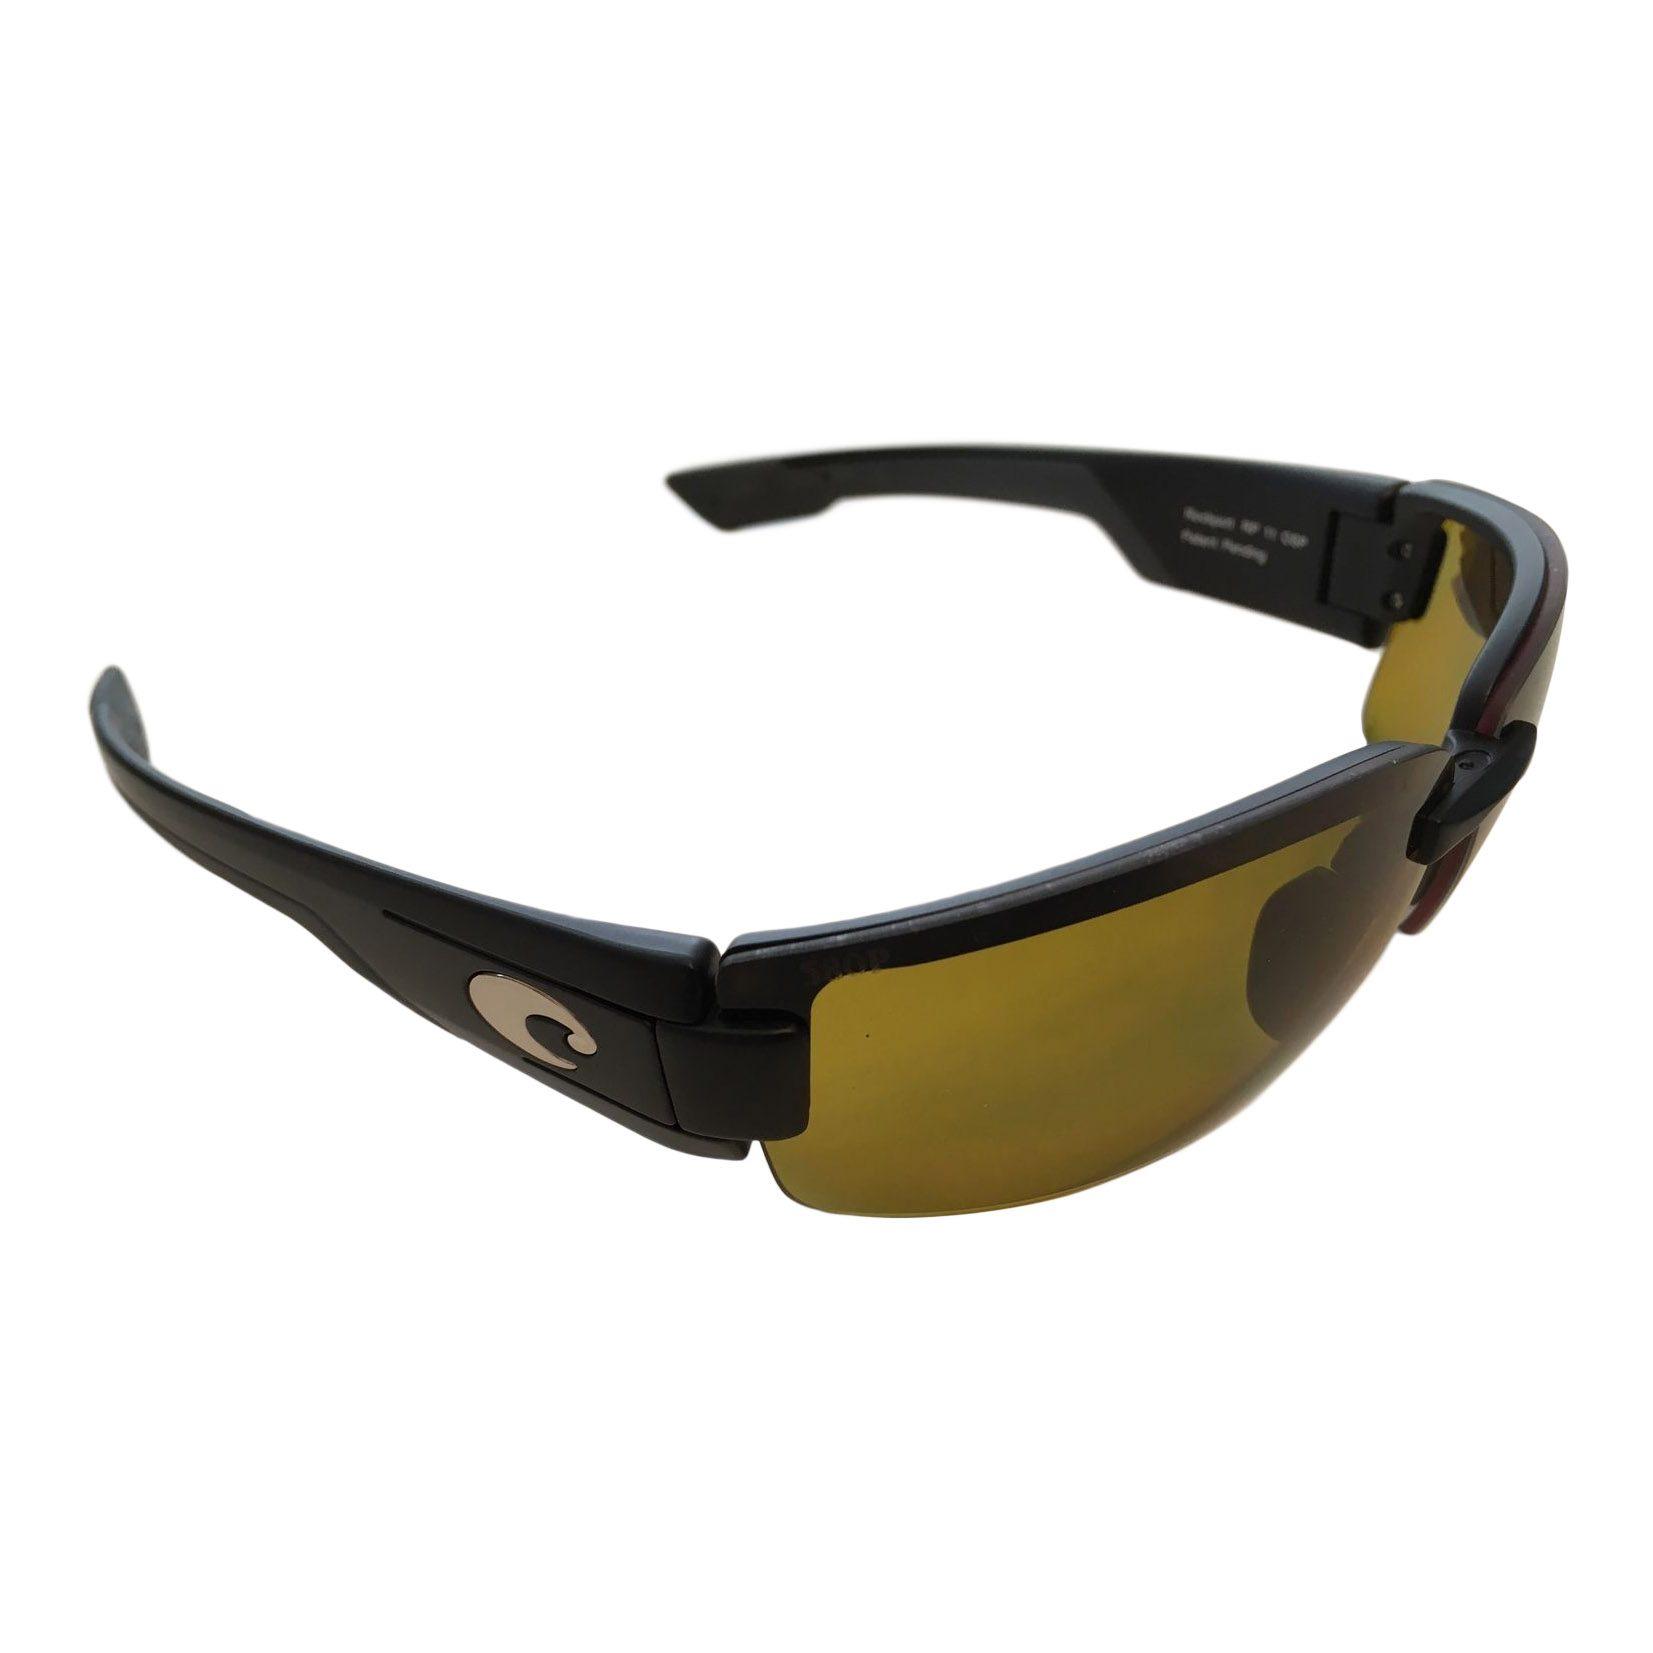 6af72b73d8db1 Costa Del Mar Rockport Sunglasses - Black Frame - Polarized Sunrise Yellow  Lens 580P